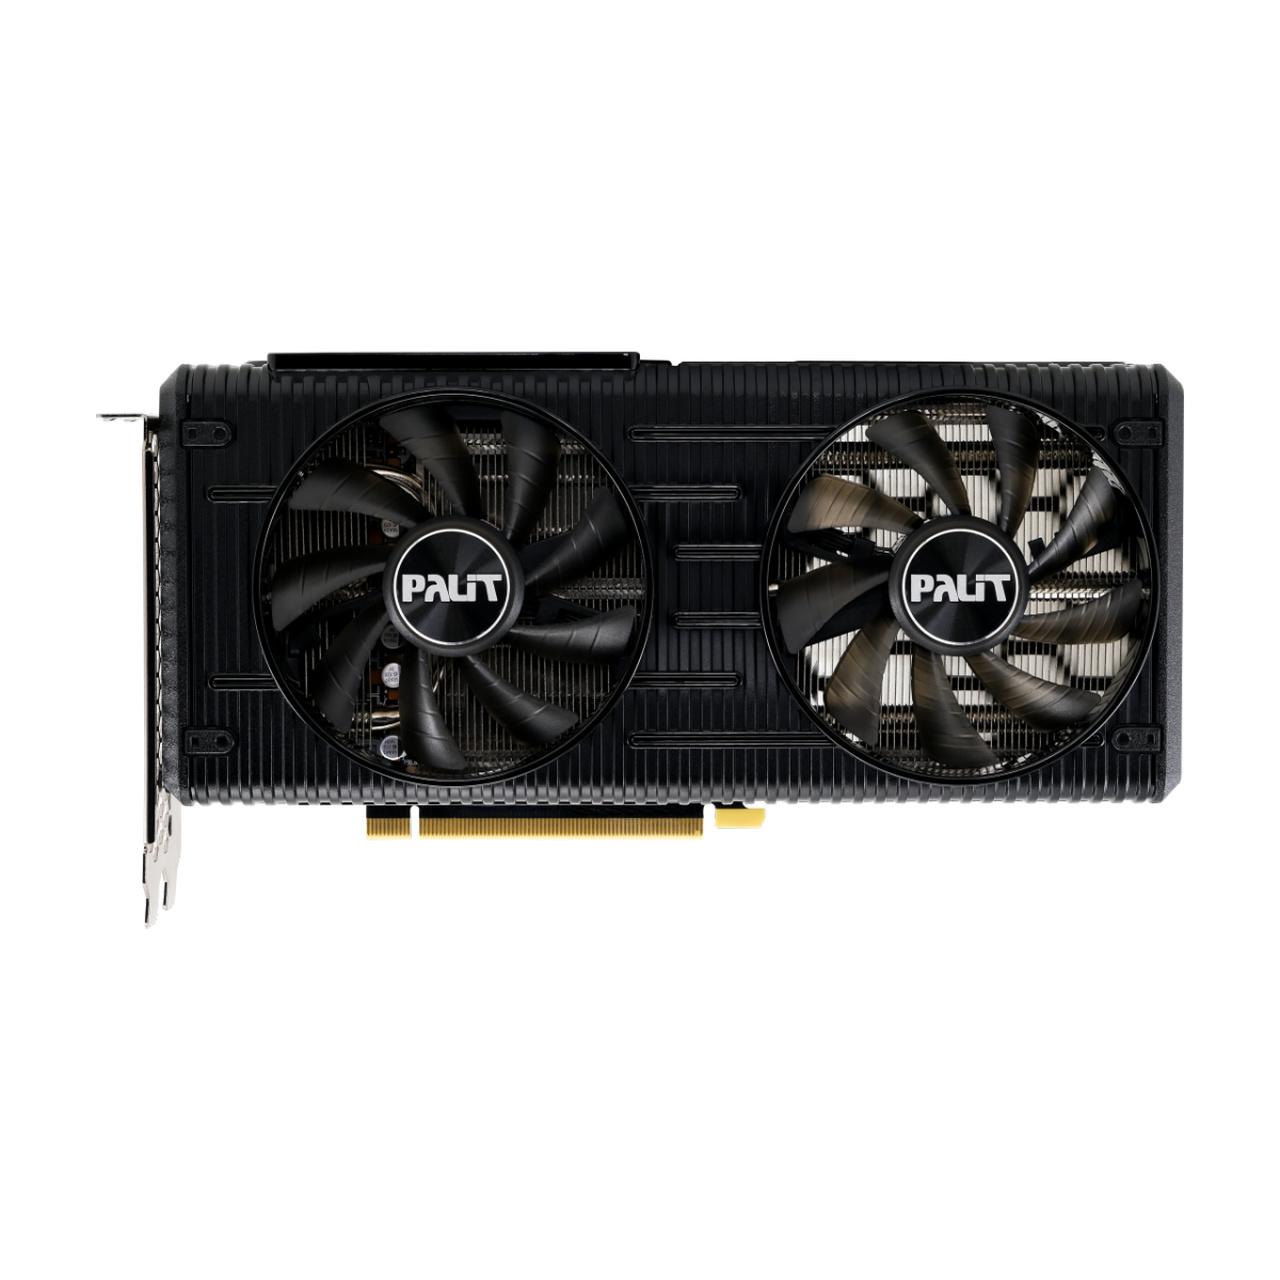 Placa de Vídeo Palit NVIDIA GeForce RTX 3060 Dual OC 12GB, GDDR6, 192bit, NE63060T19K9-190AD